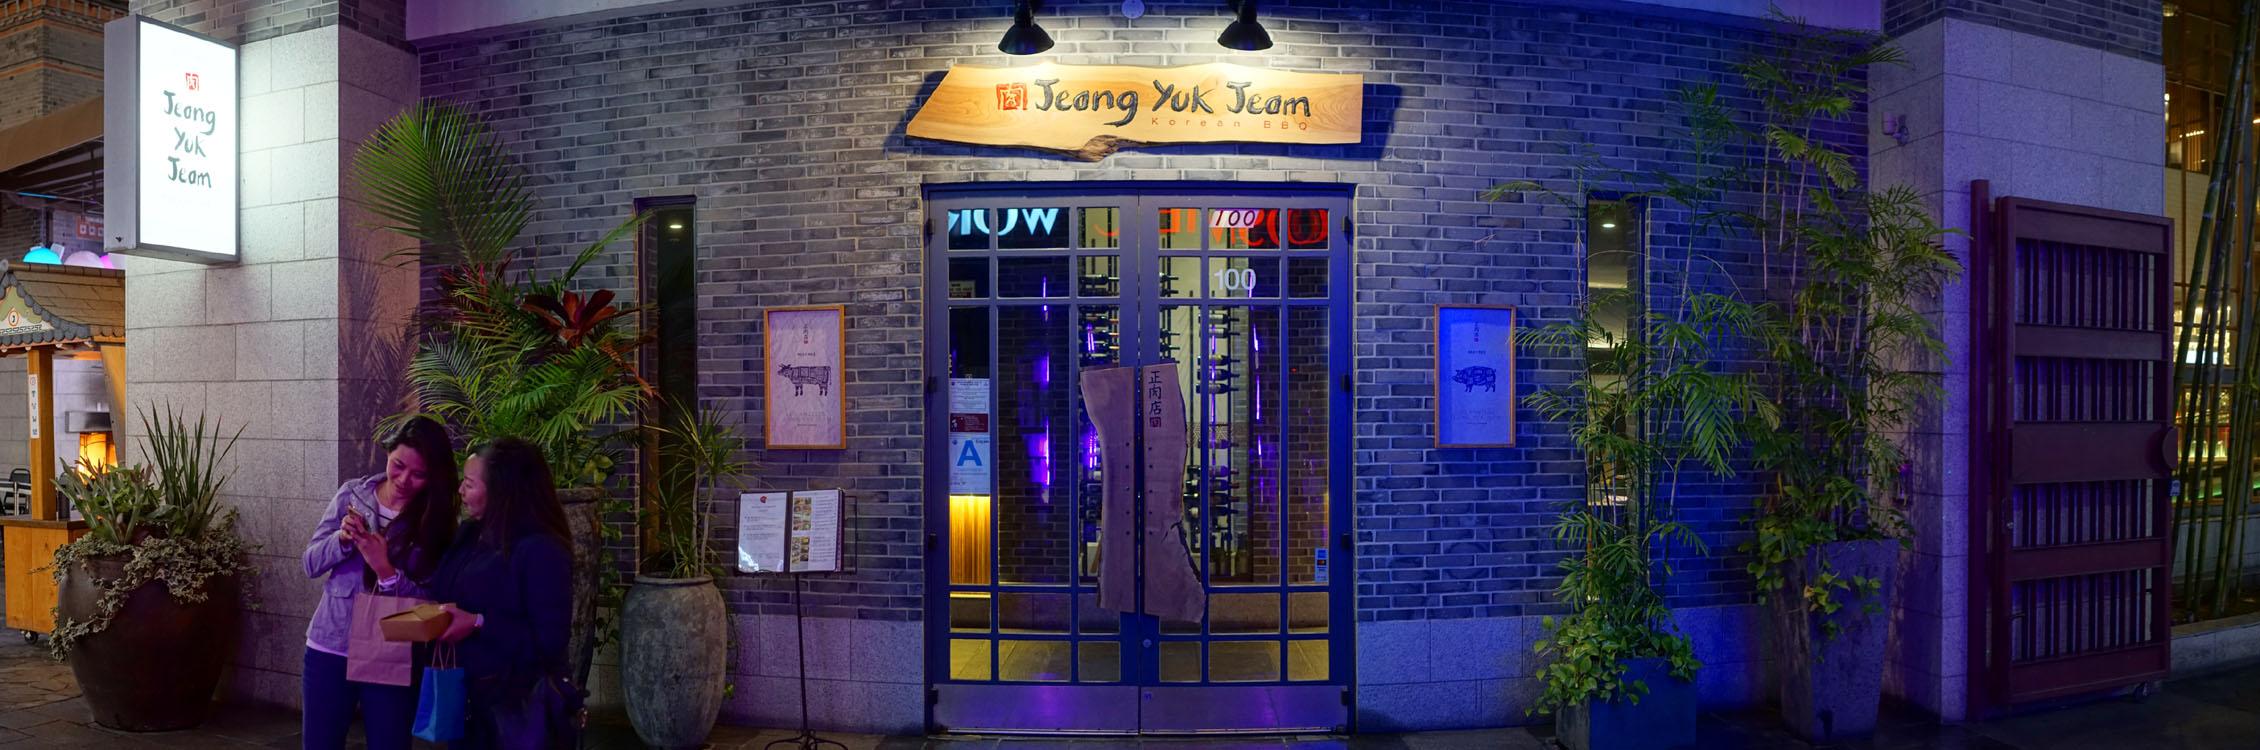 Jeong Yuk Jeom Exterior